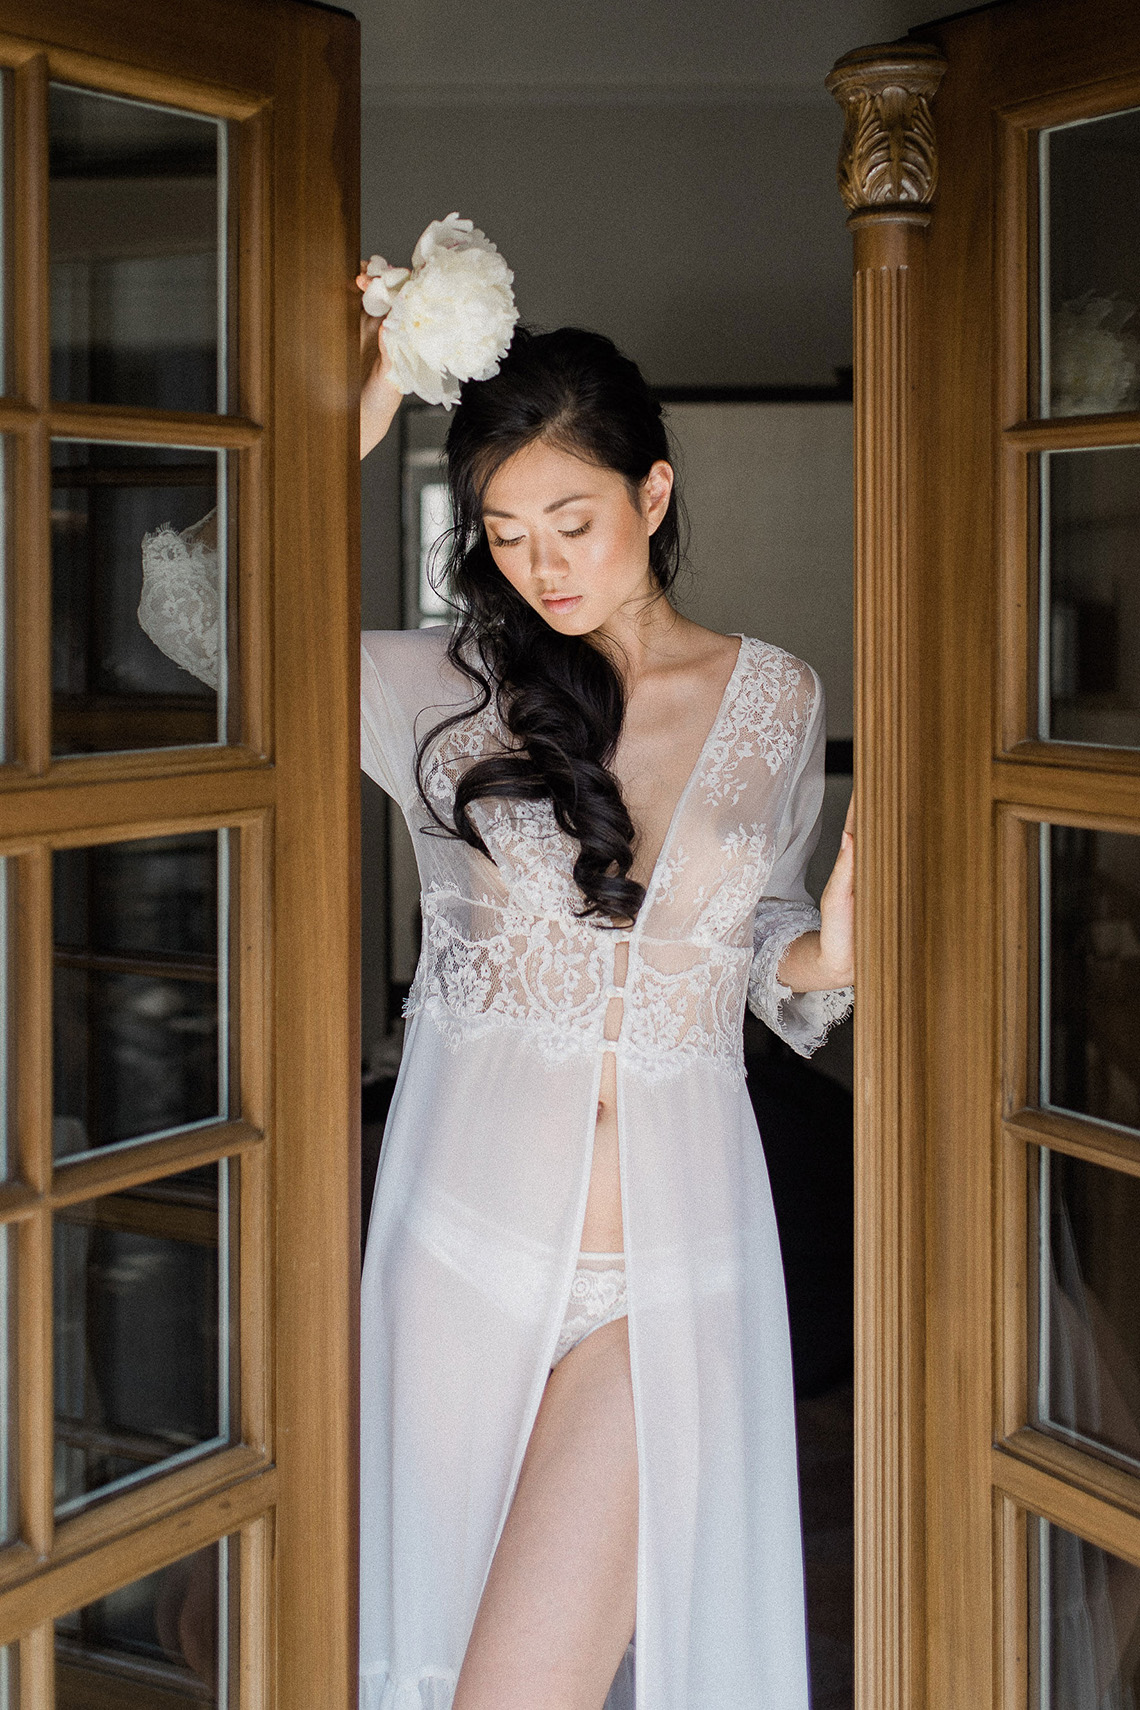 A Dramatic Gold Wedding Dress for the Goddess Bride – Vivid Symphony 14